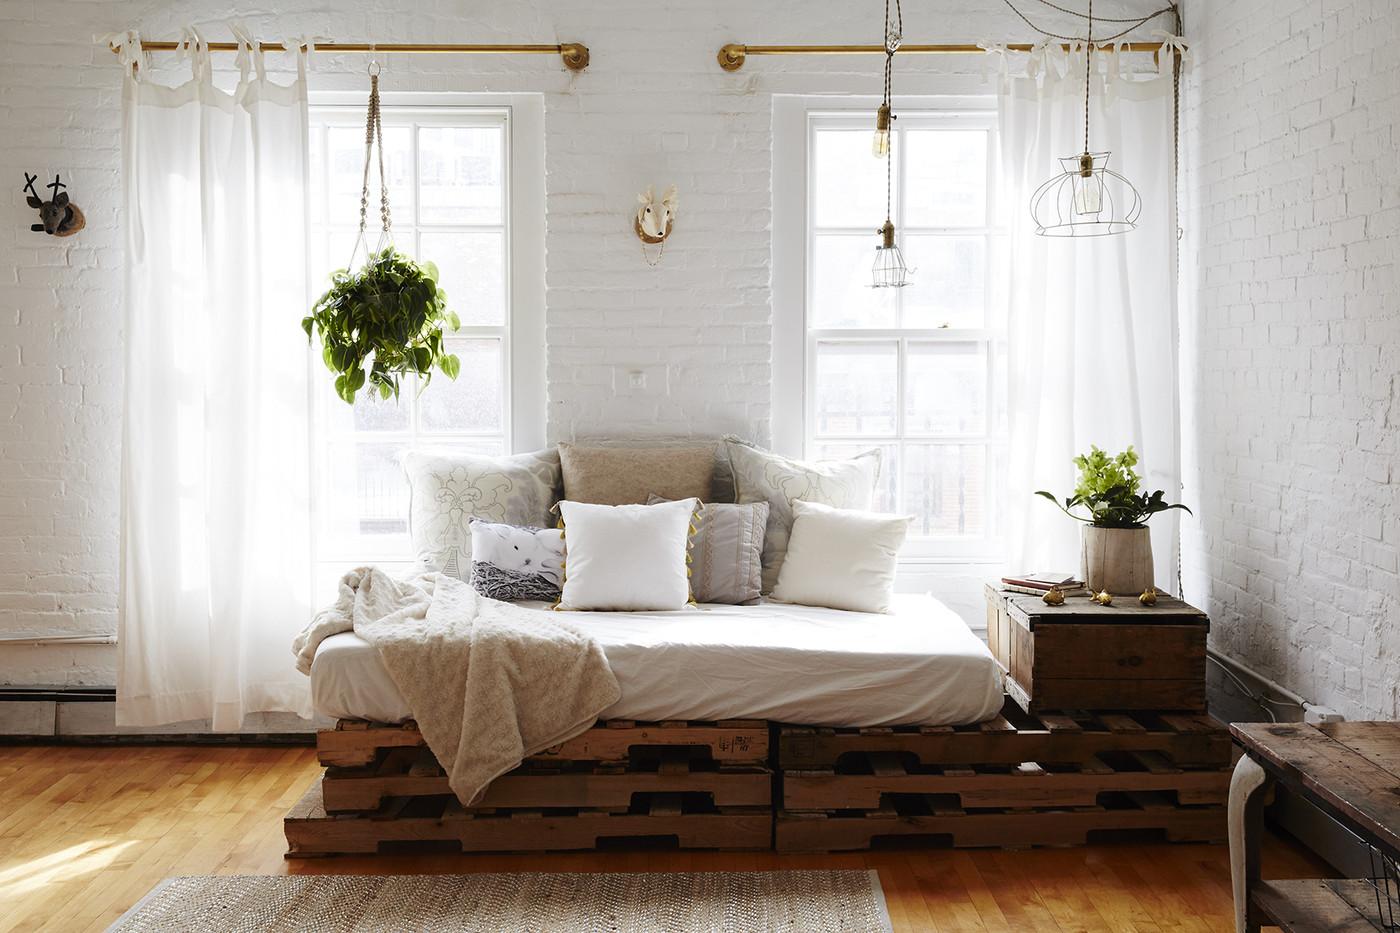 Rustic living room in the basement.  Source: Lonny.com